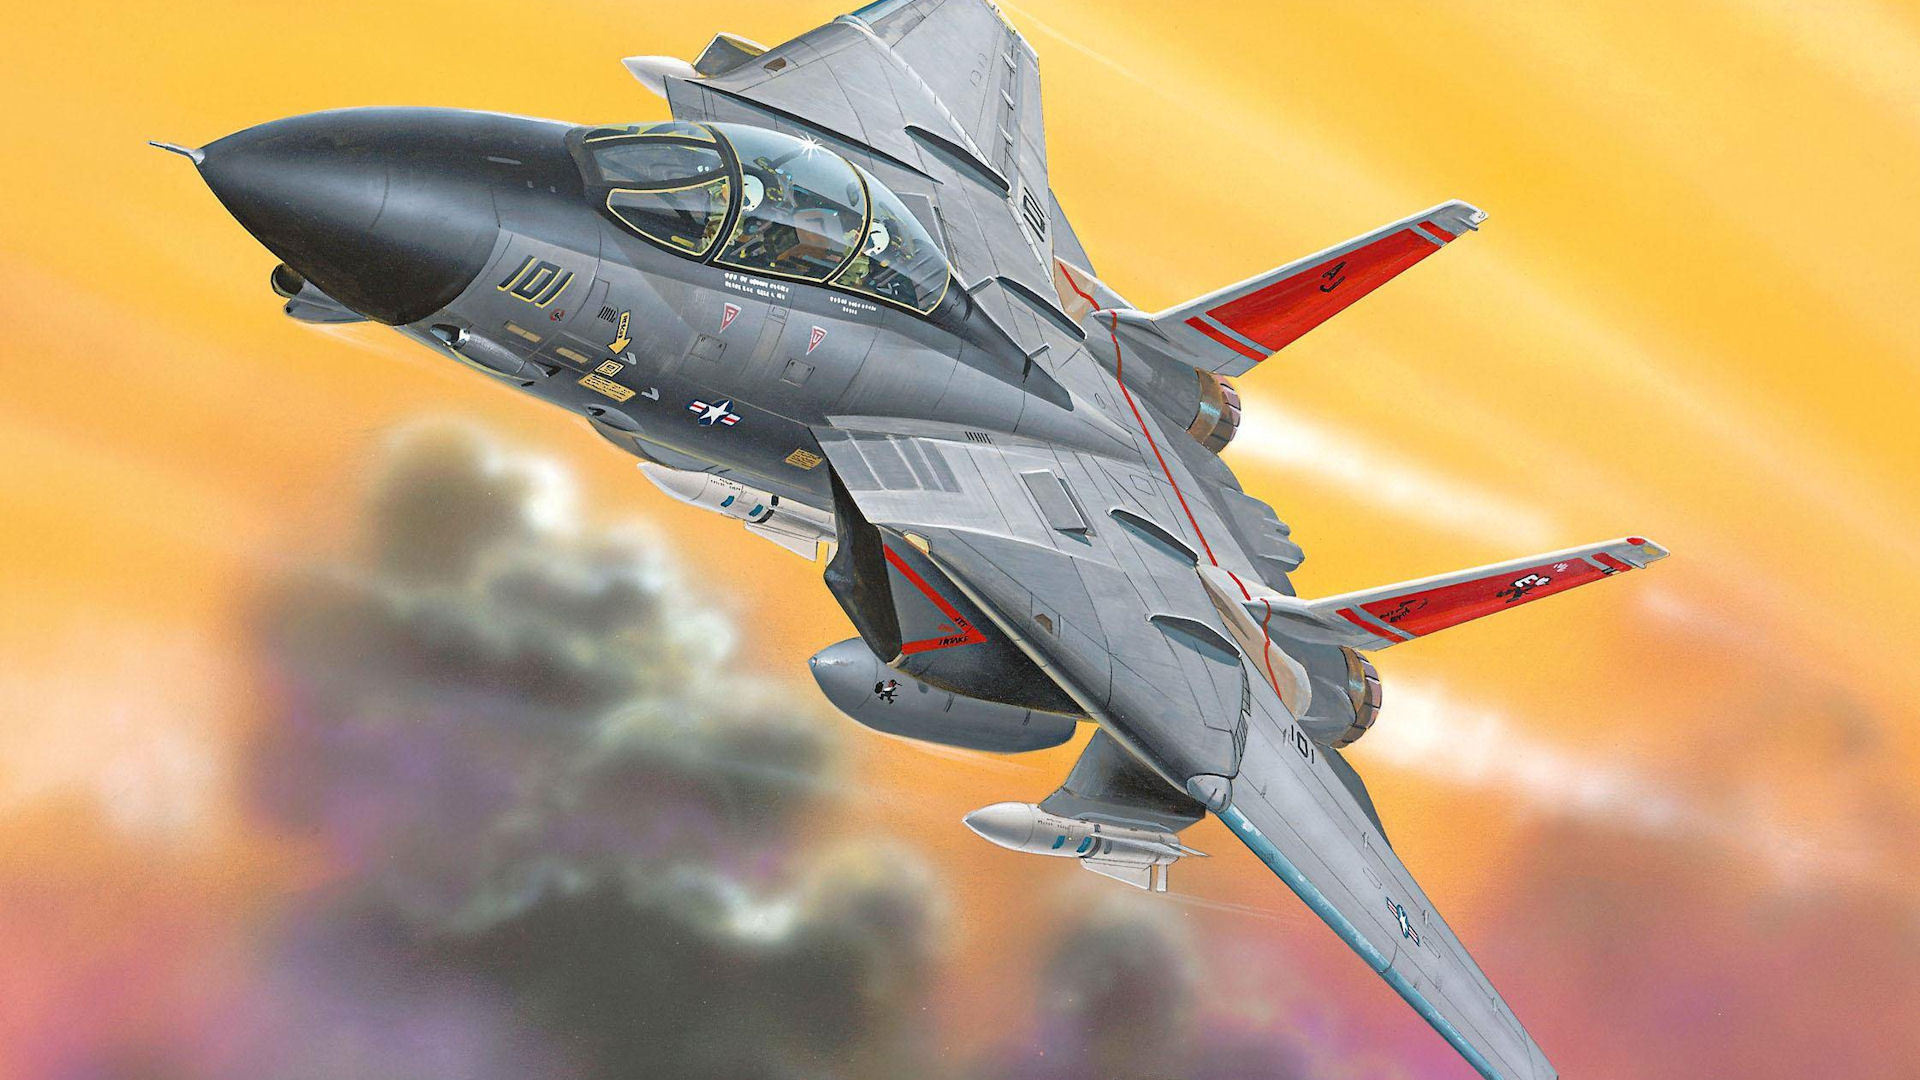 Grumman F 21 Tomcat HD Wallpaper   Background Image   21x21